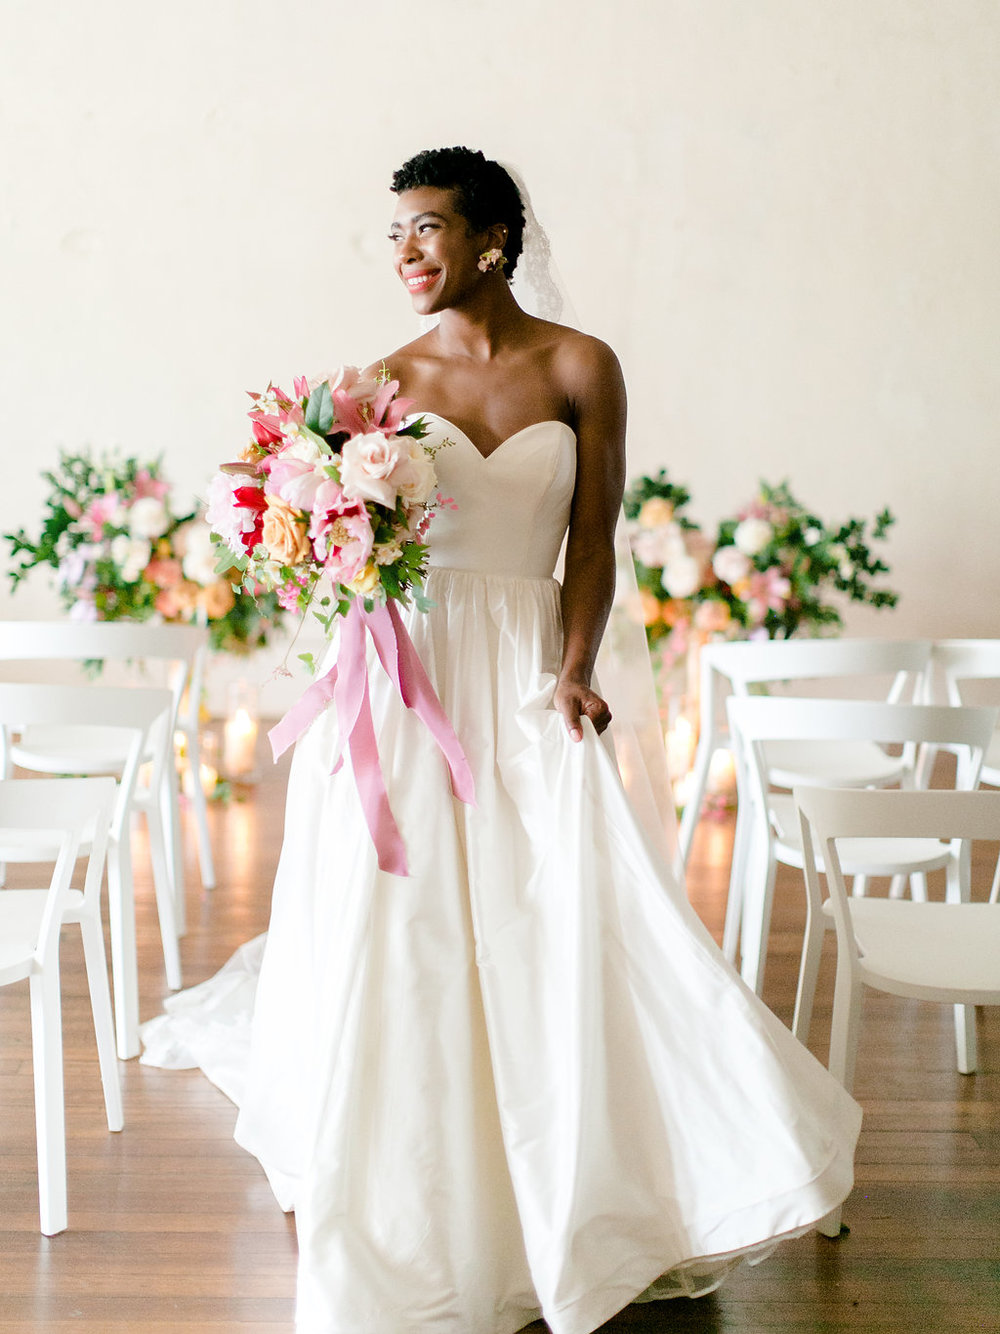 Austin-Texas-Wedding-Photographer-Carrington-Crossing-Buda-16.jpg